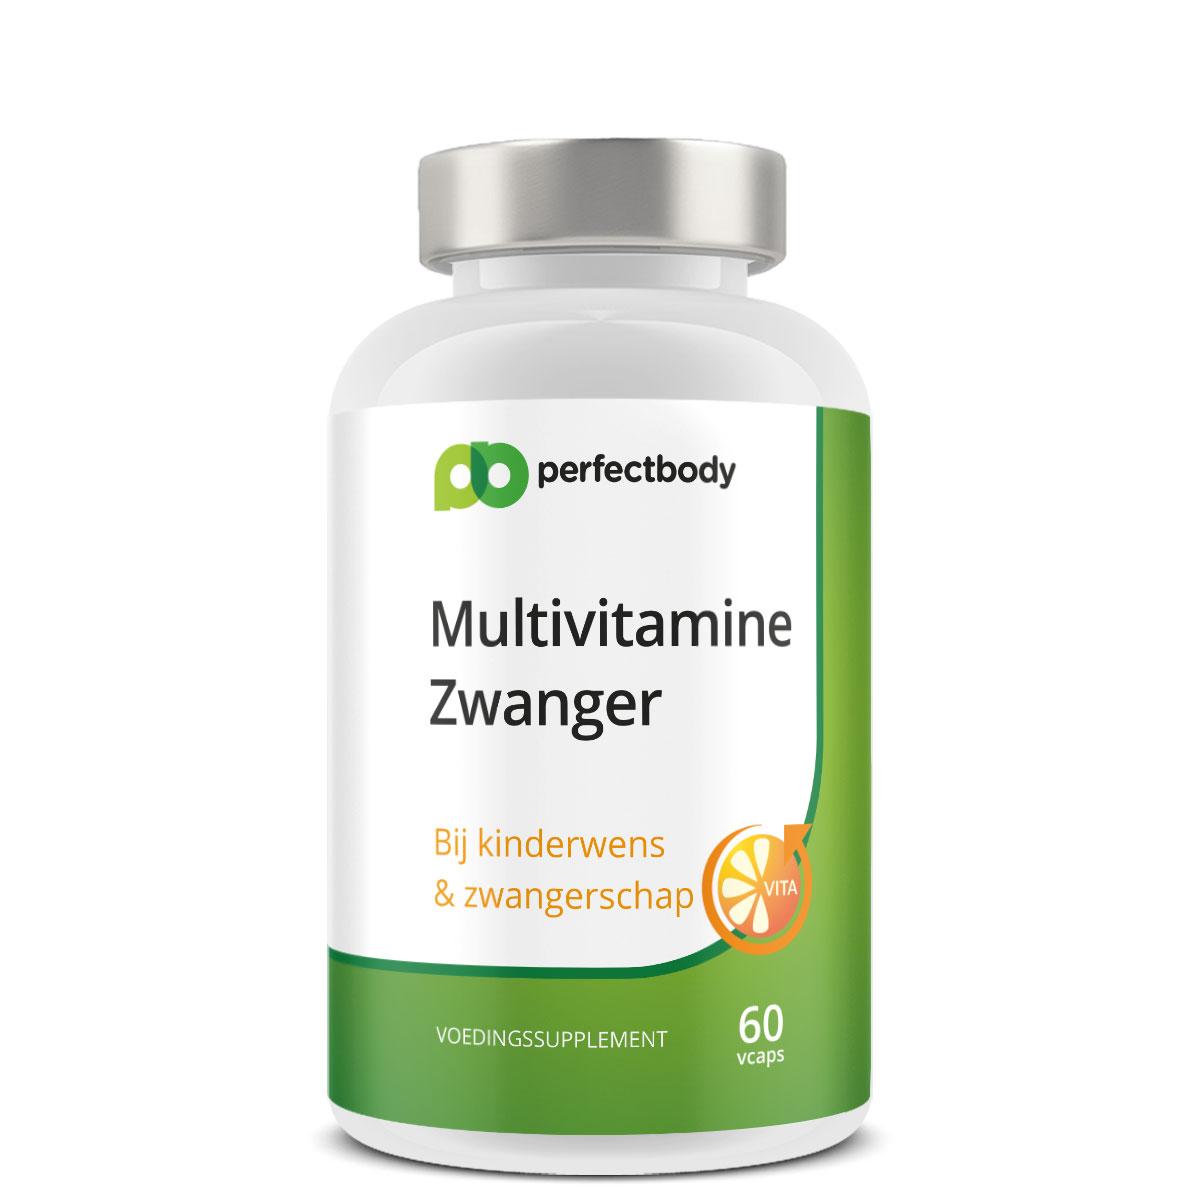 Perfectbody Multivitamine Zwangerschap - 60 Vcaps